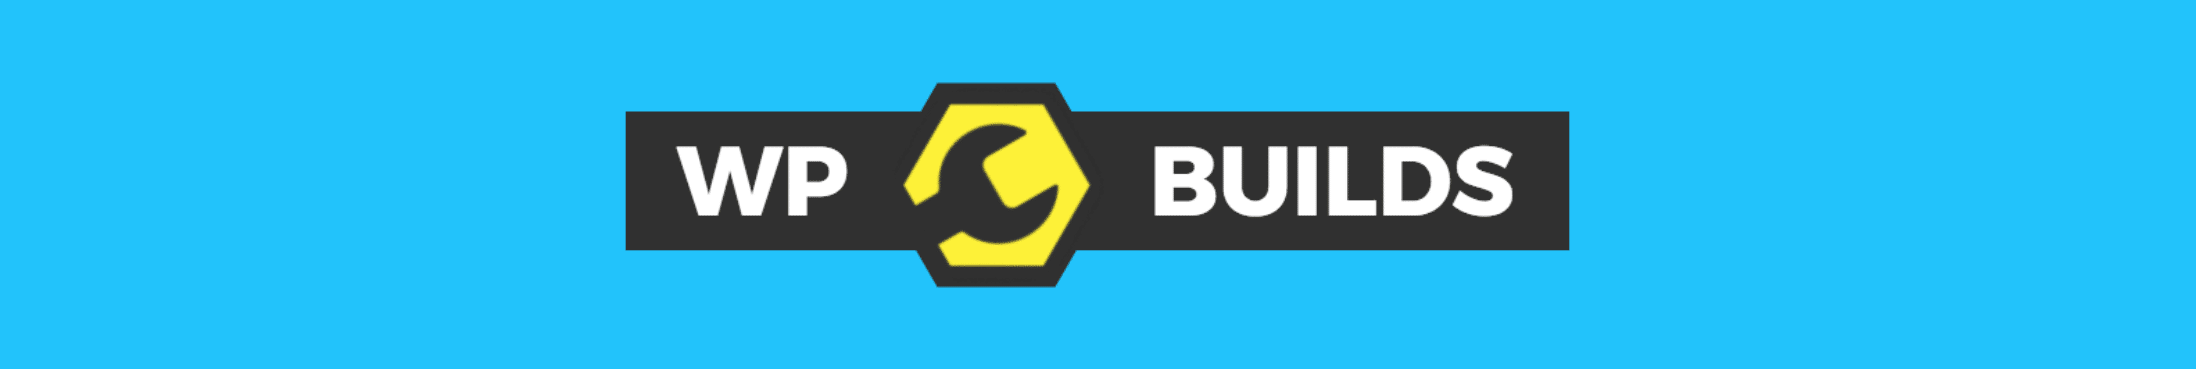 WP Buildsポッドキャスト